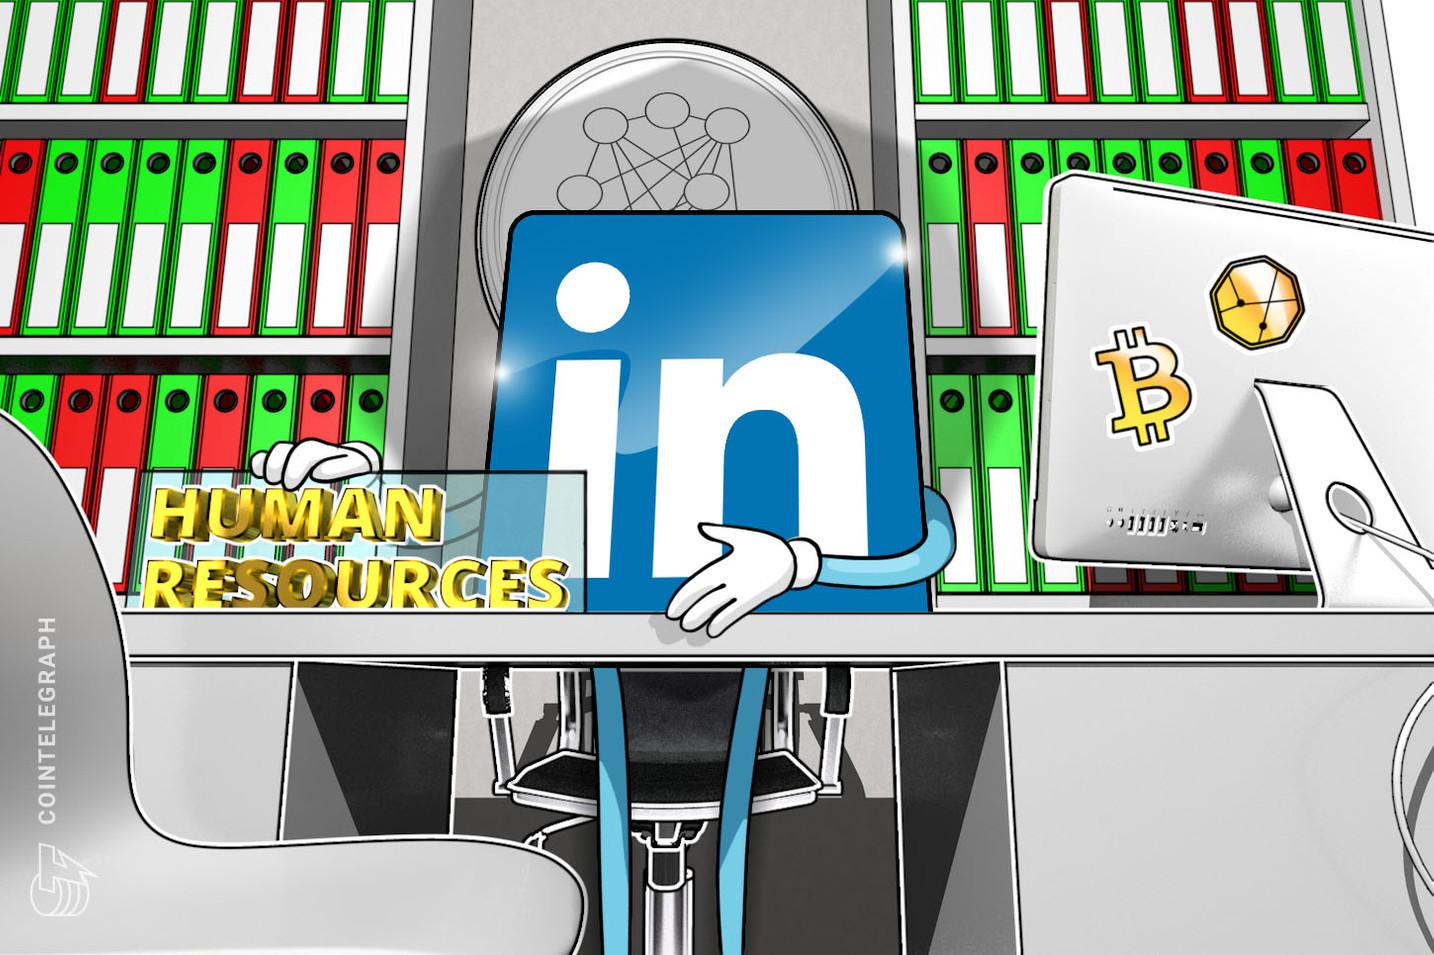 Coinbase, Ripple Leave Top 10 of LinkedIn's 'Hottest' Startups List